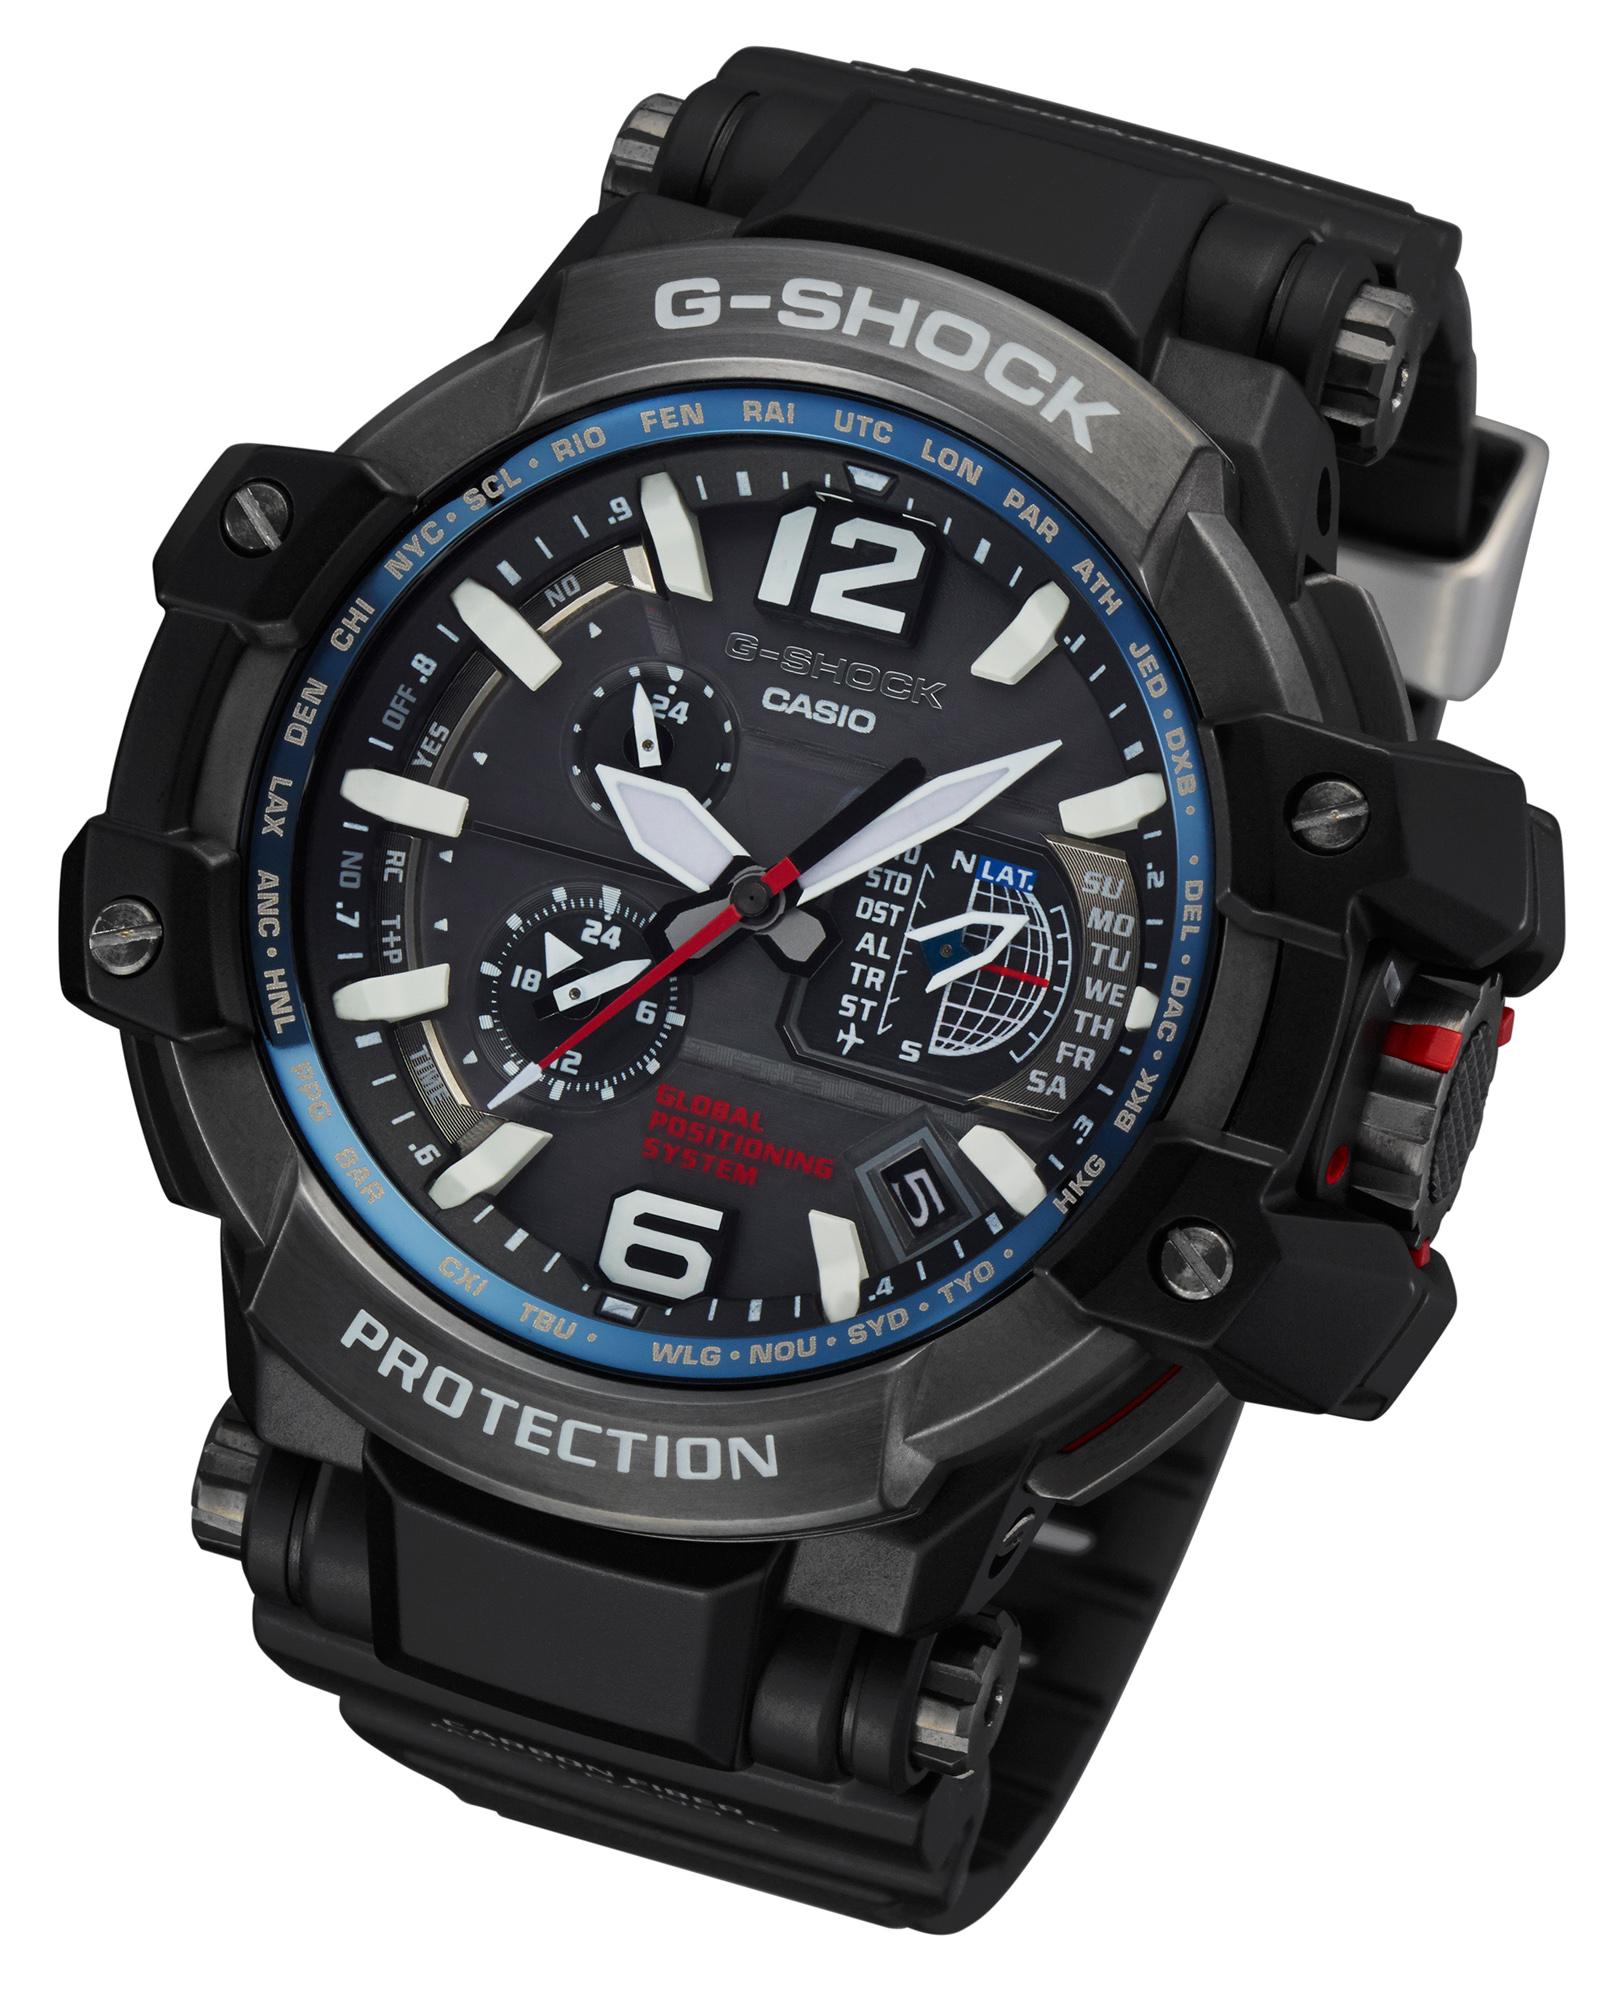 Casio G-Shock GPW-1000 GPS - Baselworld 2014